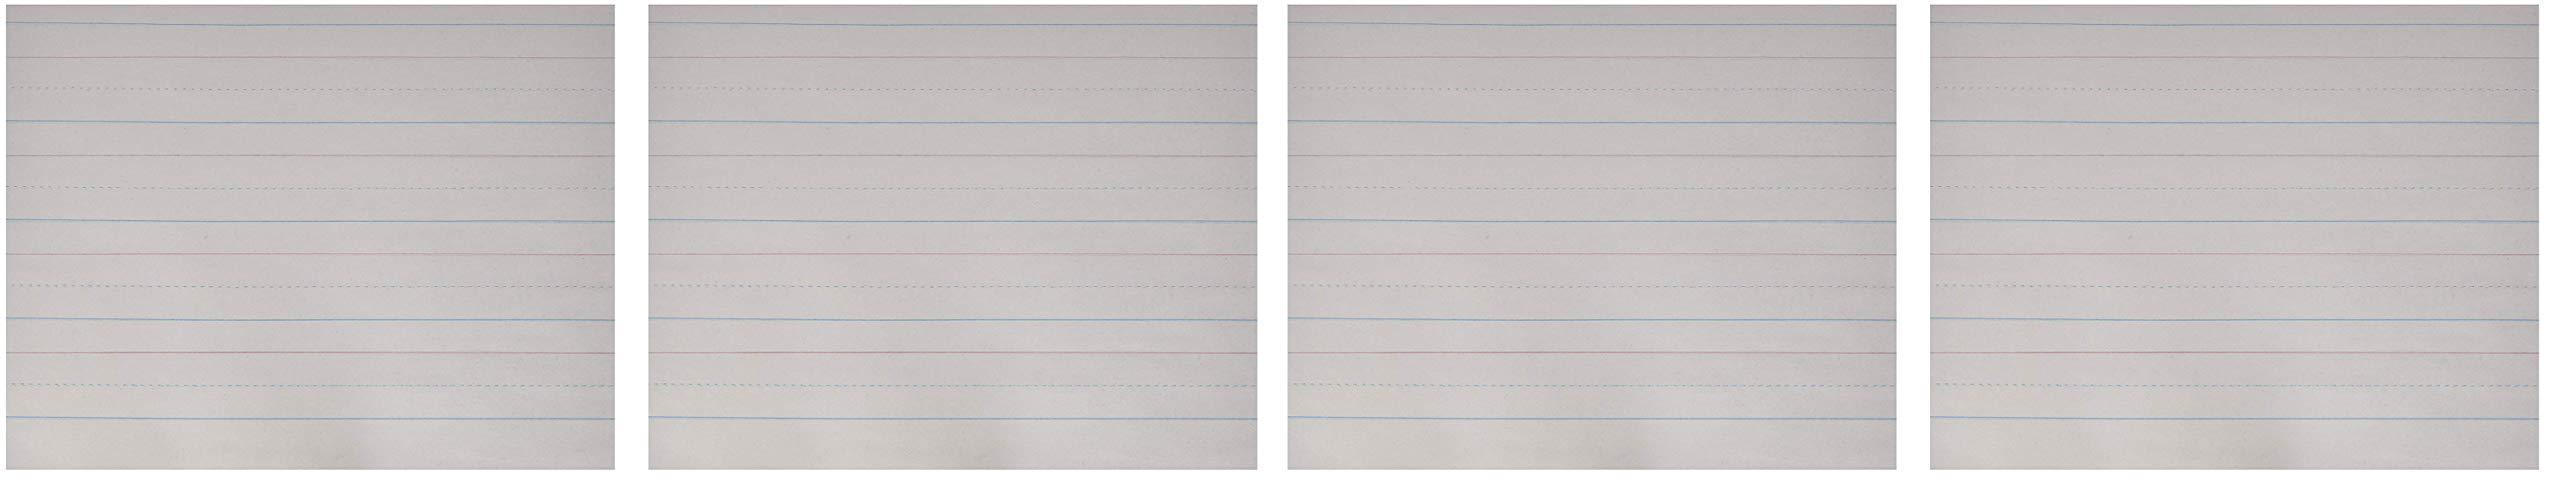 School Smart Zaner-Bloser Handwriting Paper, 10-1/2 x 8 Inches, 500 Sheets (Fоur Расk)